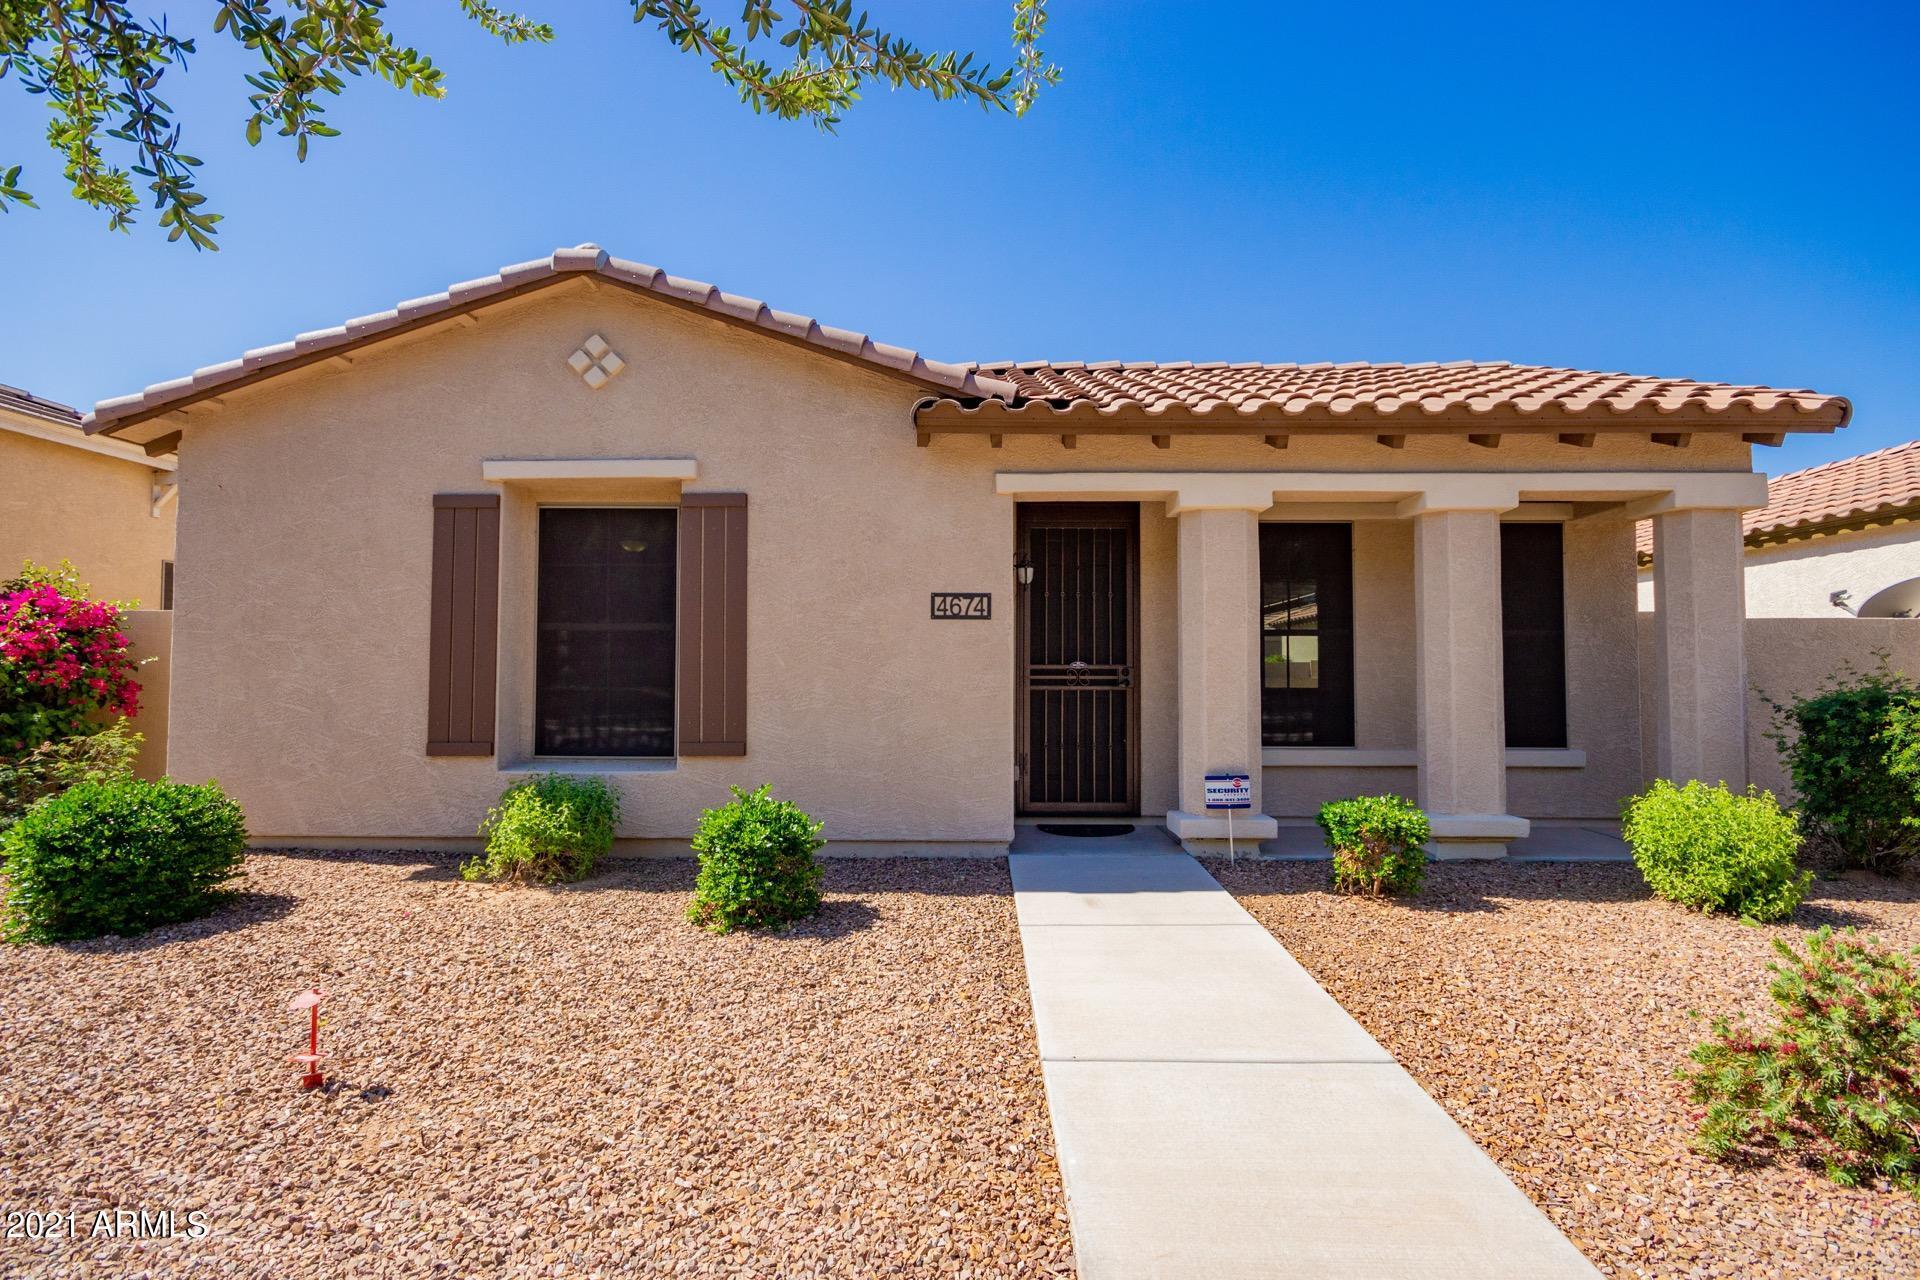 4674 MAPLEWOOD Street, Gilbert, Arizona 85297, 3 Bedrooms Bedrooms, ,2.5 BathroomsBathrooms,Residential,For Sale,MAPLEWOOD,6239041